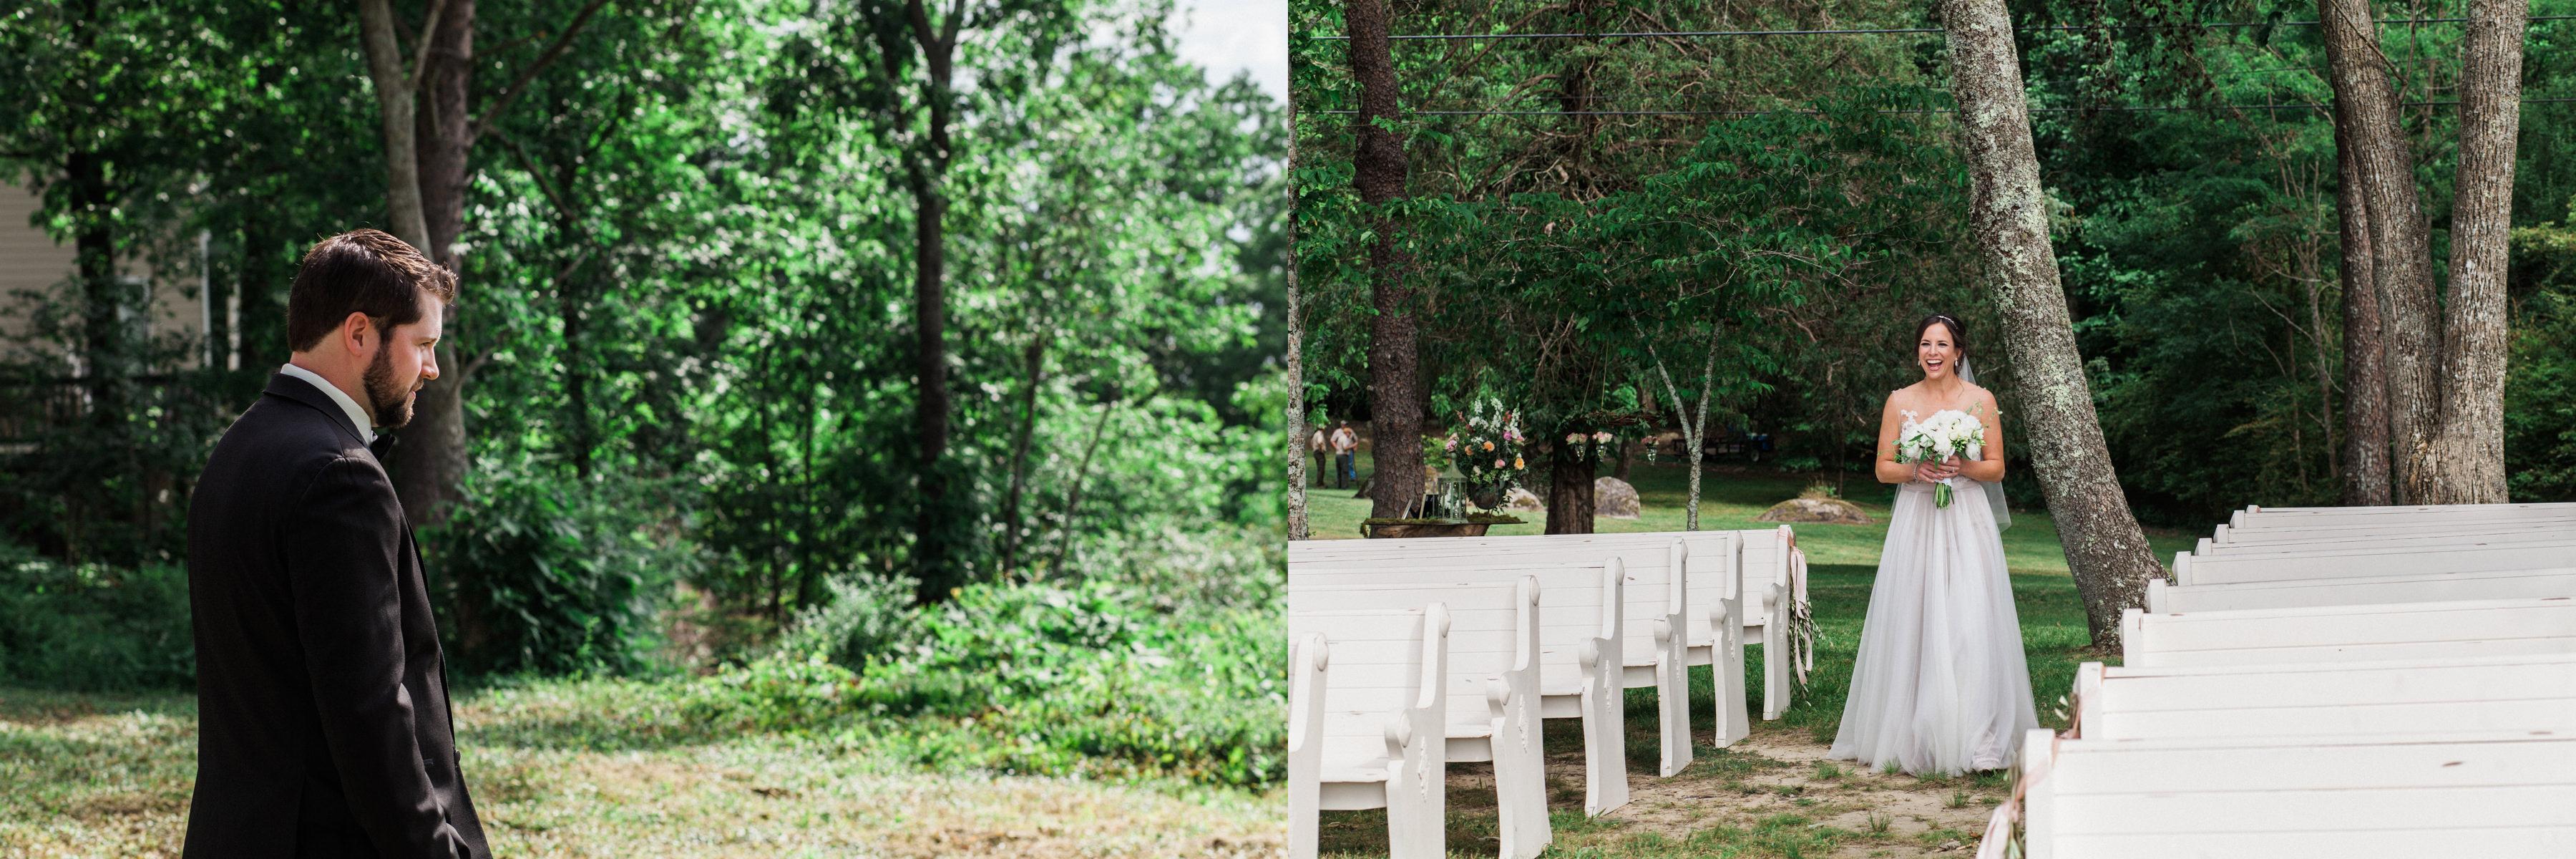 Mentone Alabama Wedding Photography